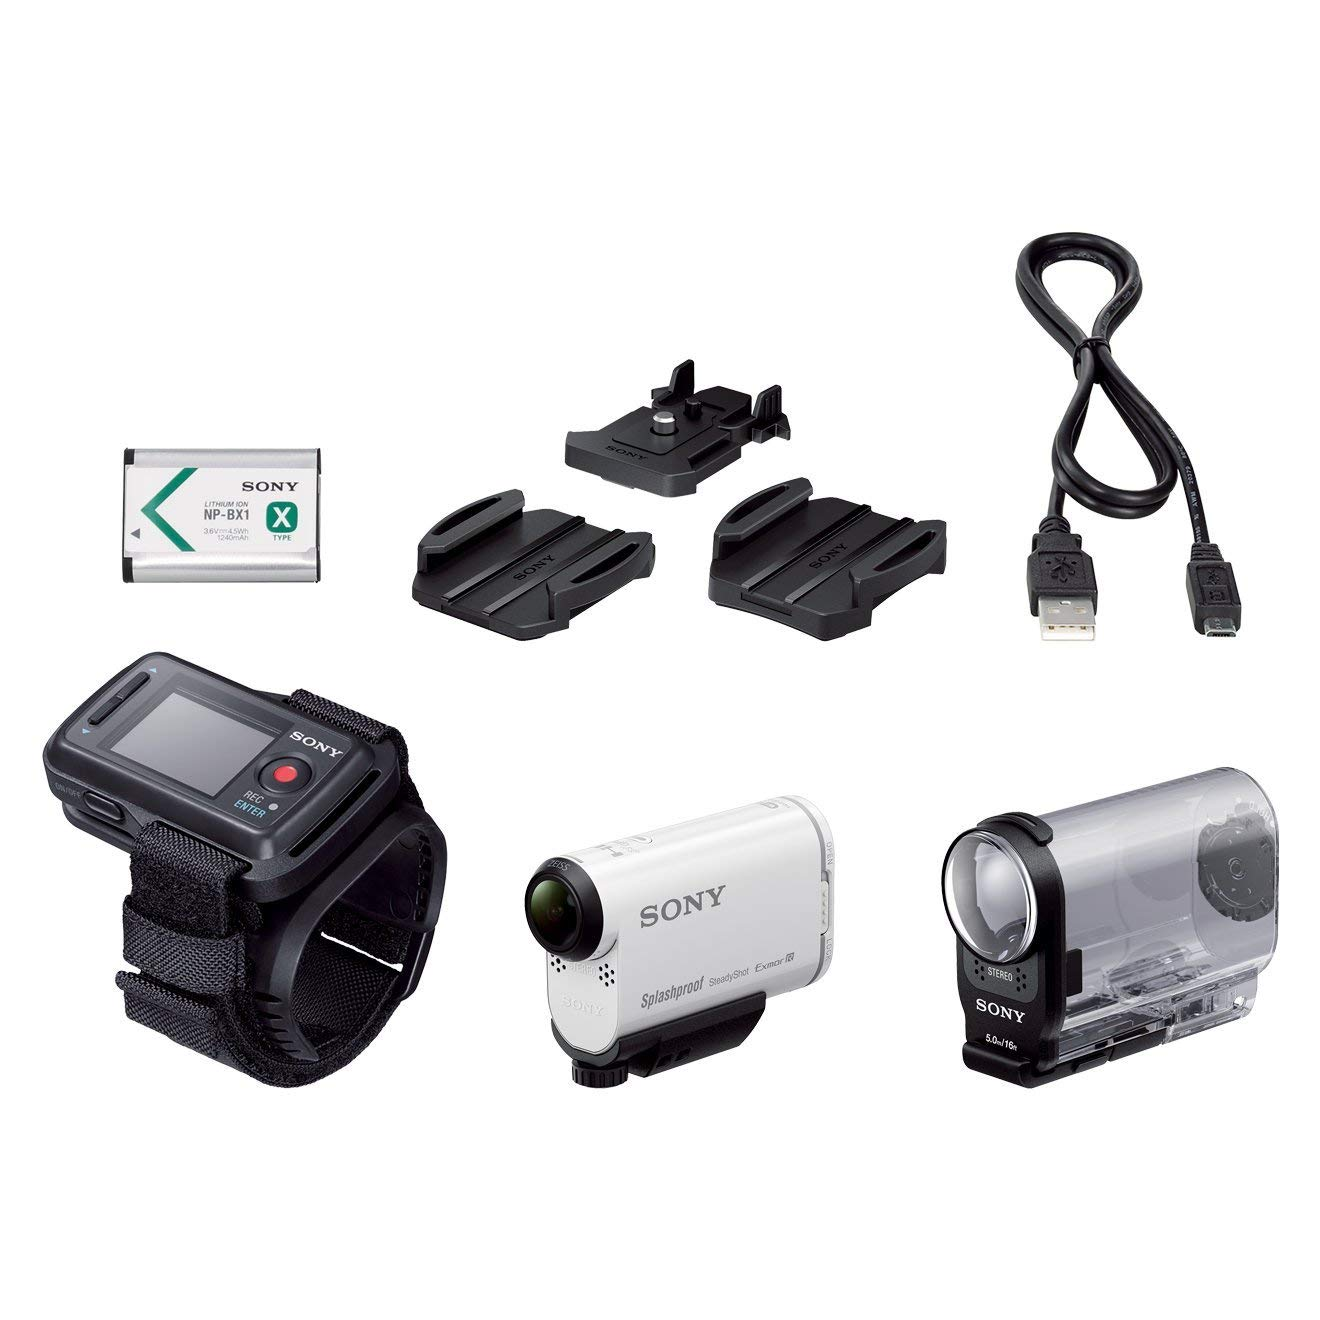 Sony HDRAS200VR.CEN - Cámara de Video, Memoria Flash